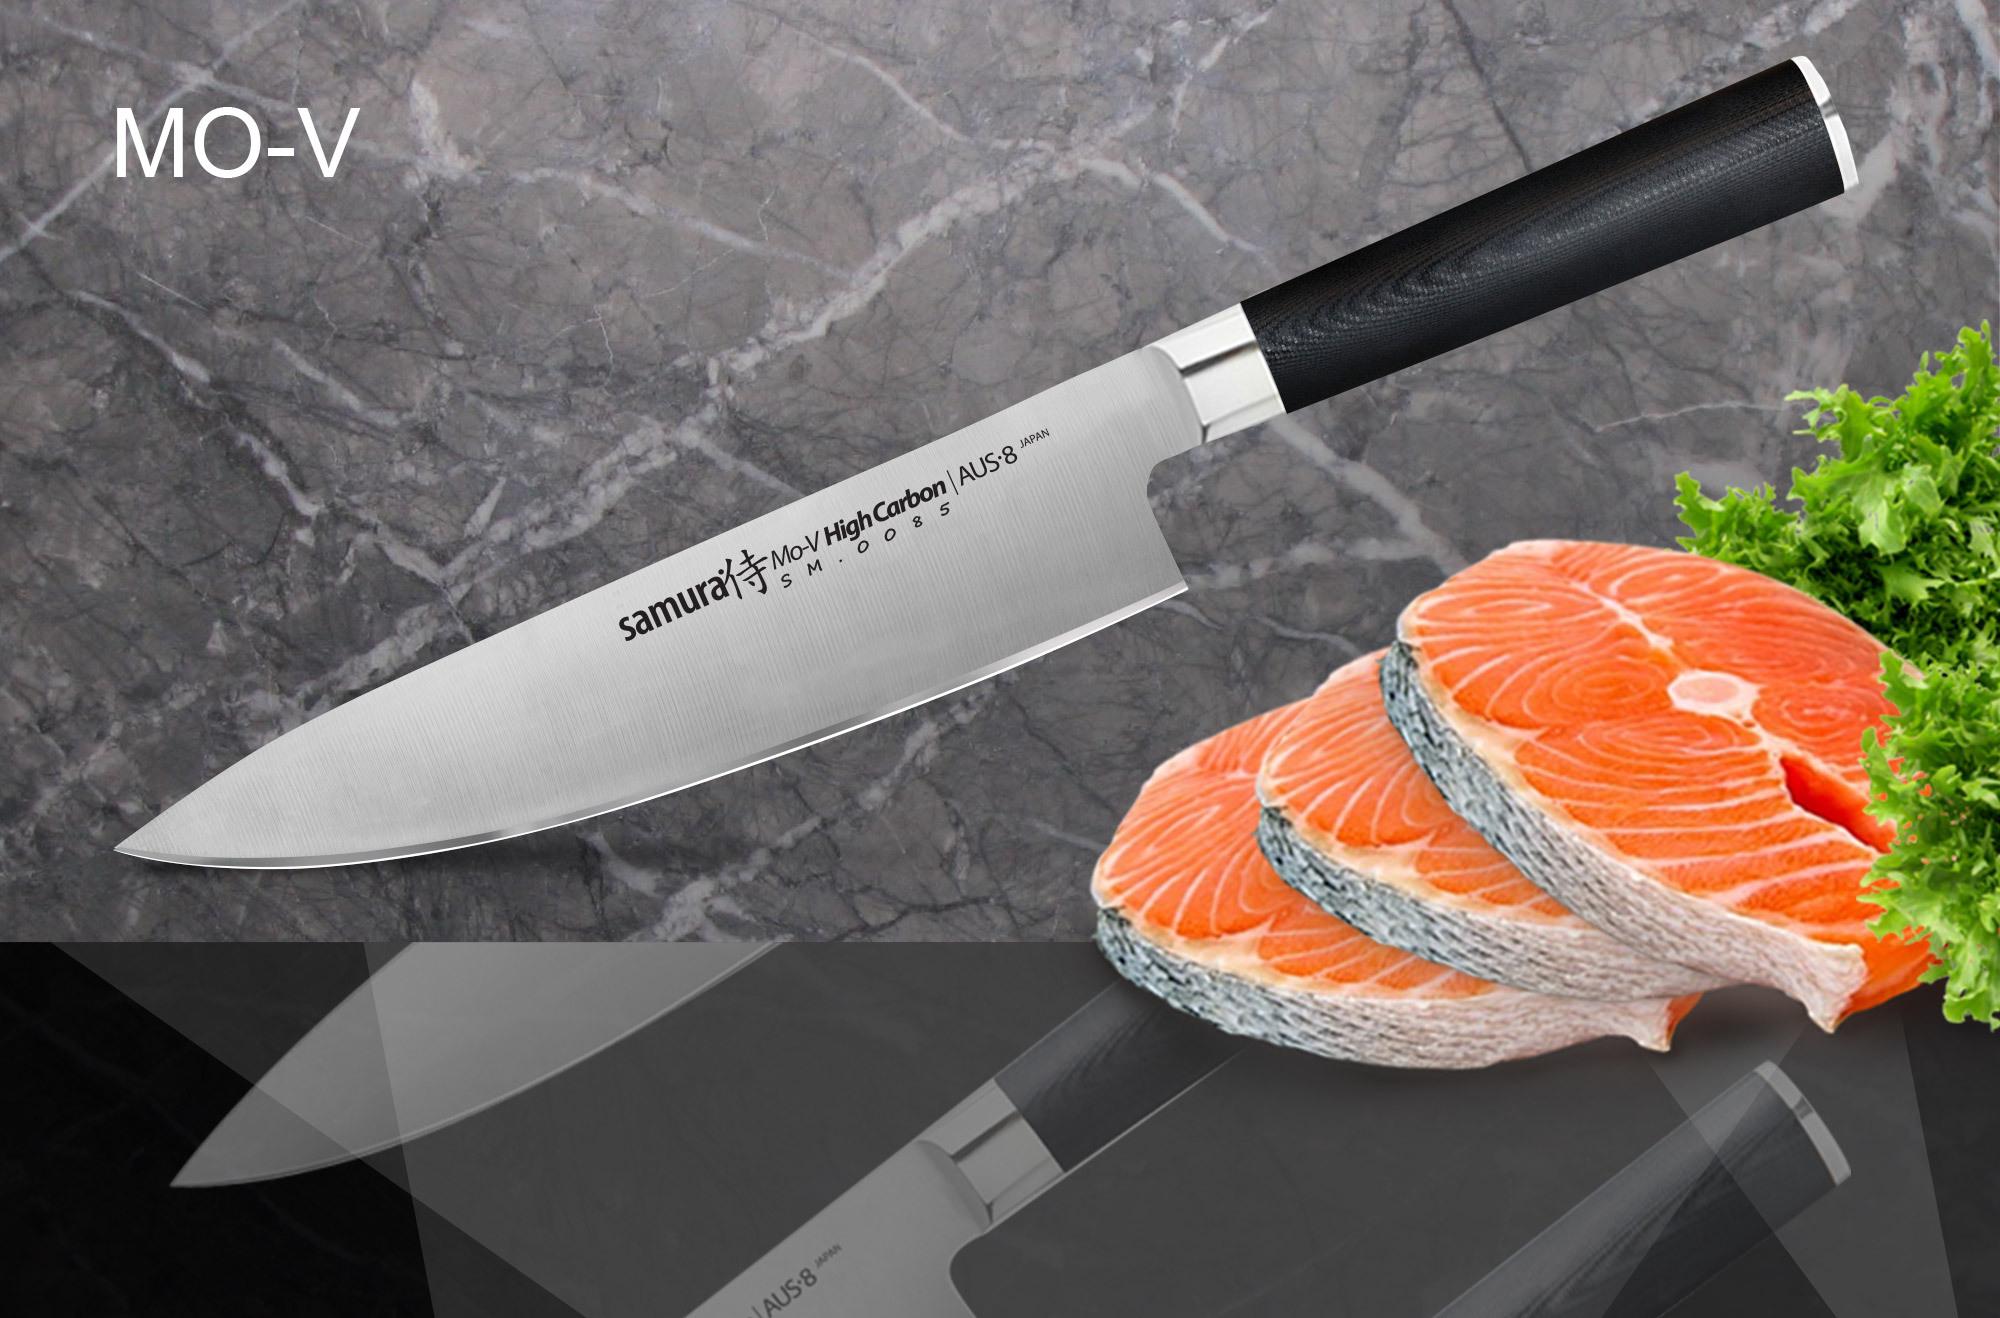 Однослойный_нож.jpg